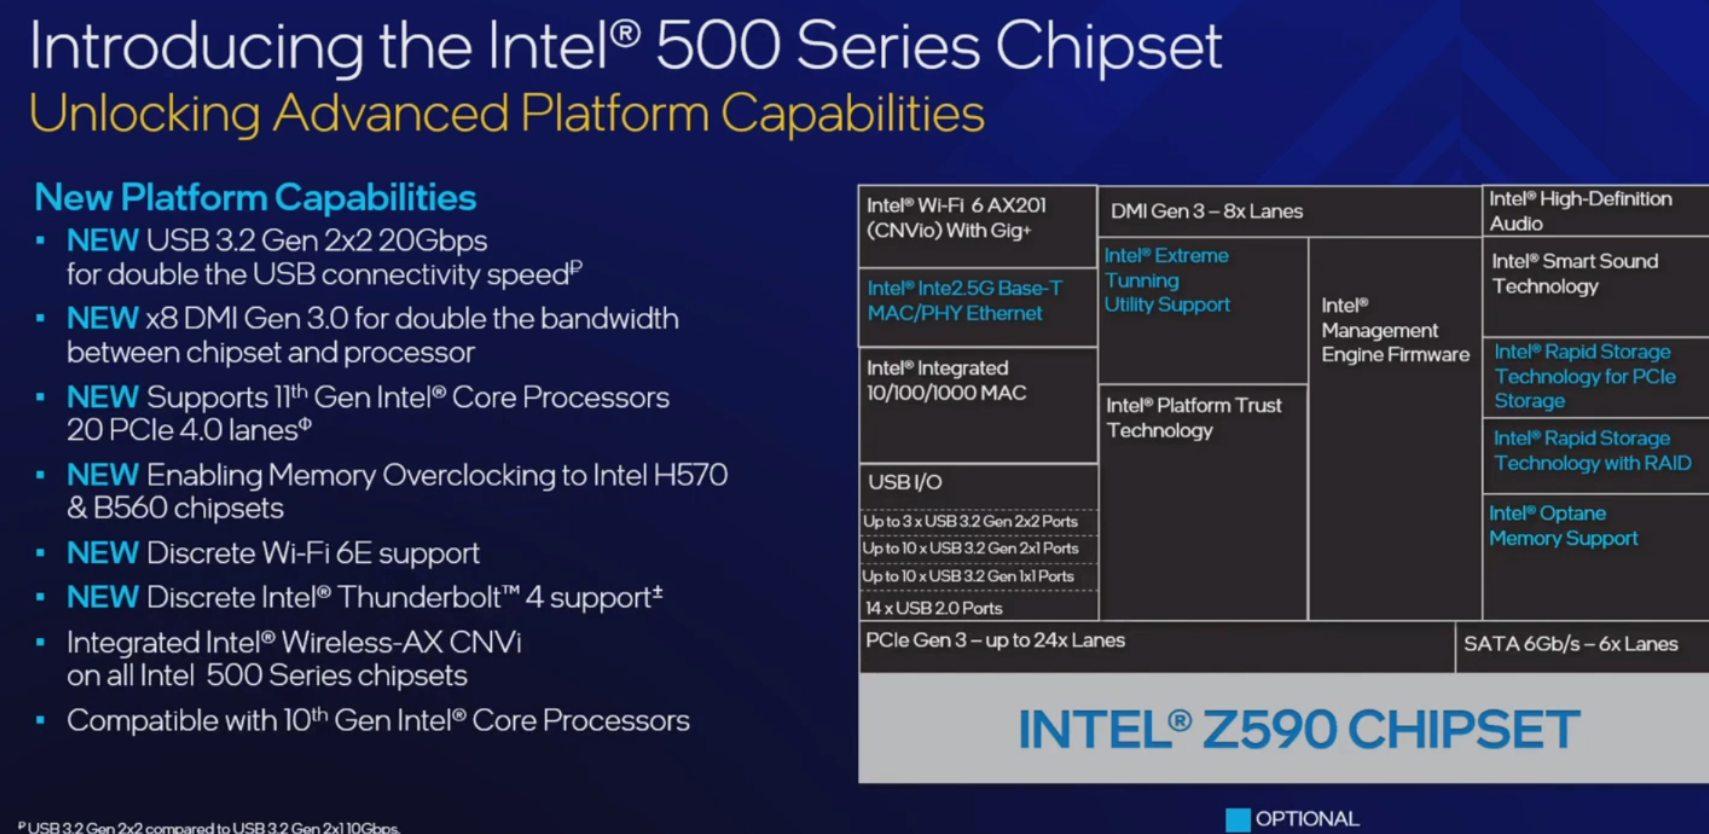 Rocket Lake S chipset features summarized